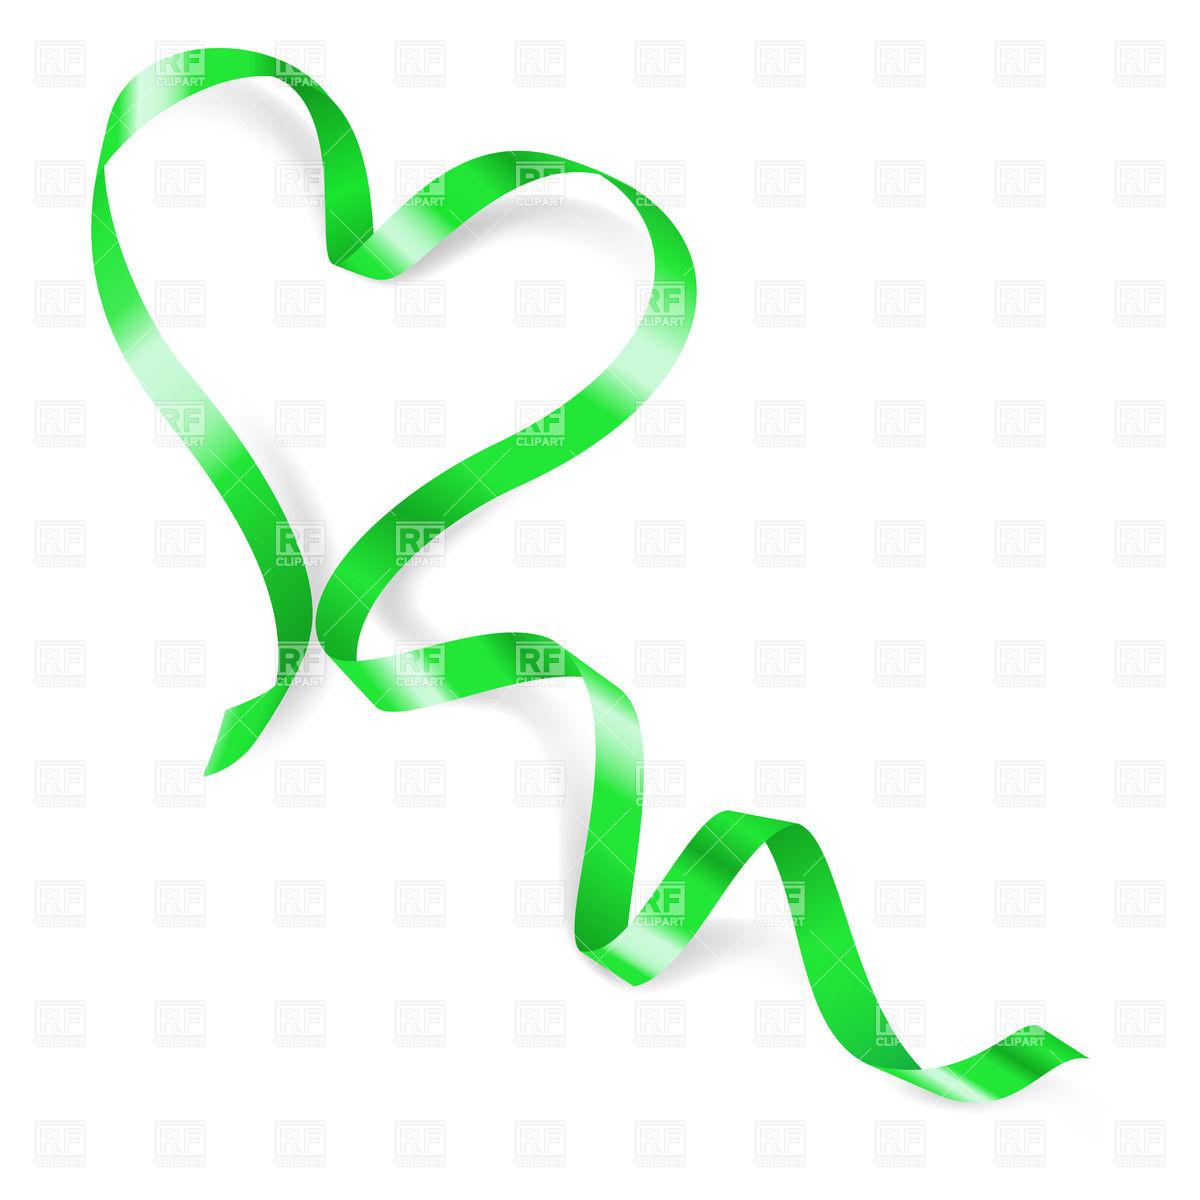 1200x1200 Heart Made Of Green Ribbon Vector Image Vector Artwork Of Design